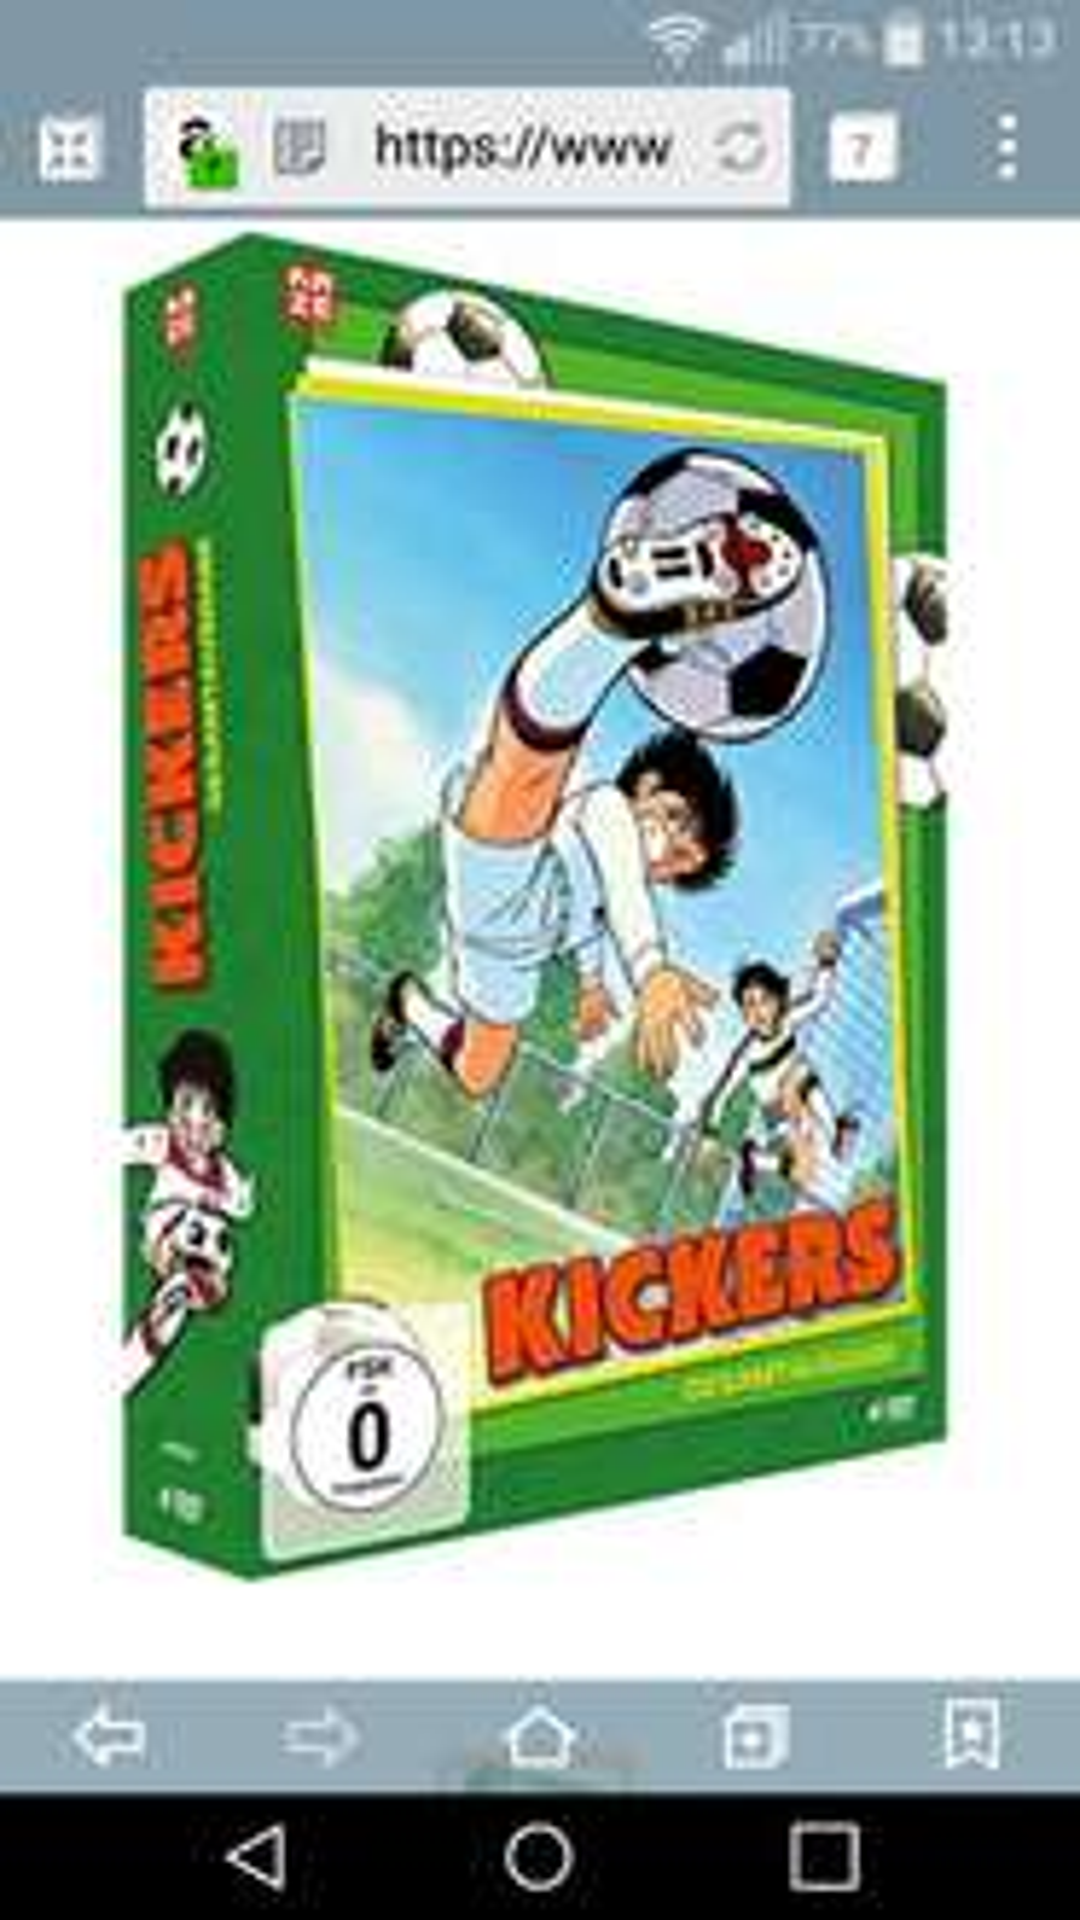 Kickers Komplettbox 4 DVDs bei Amazon